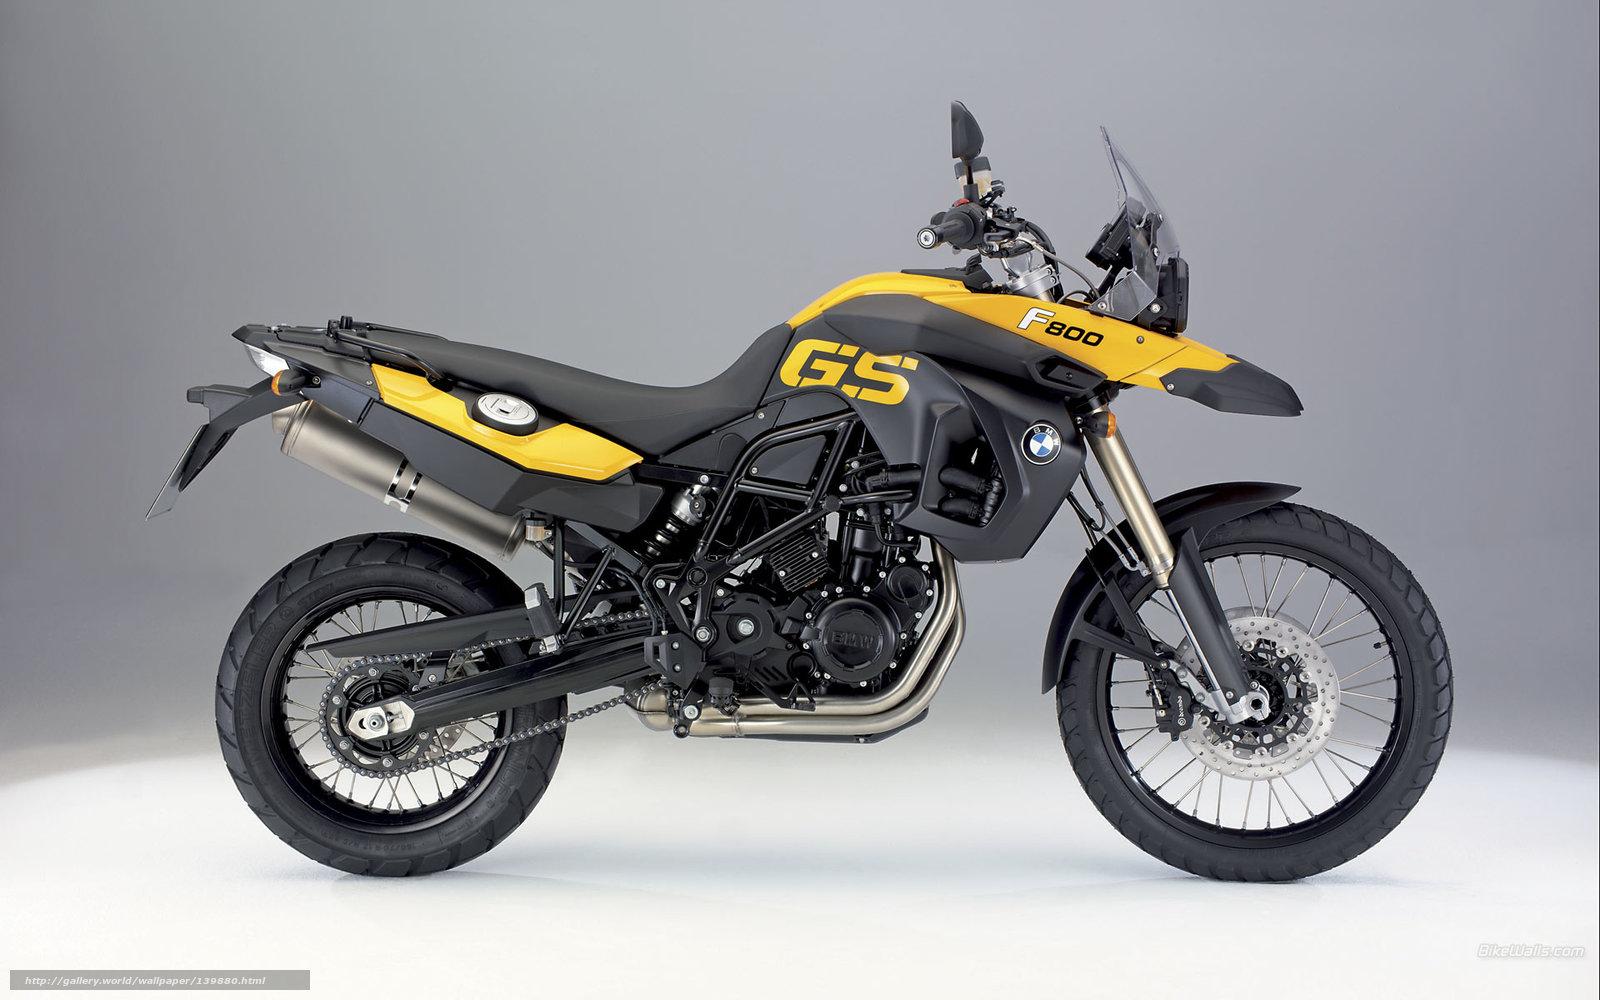 Bmw enduro 650